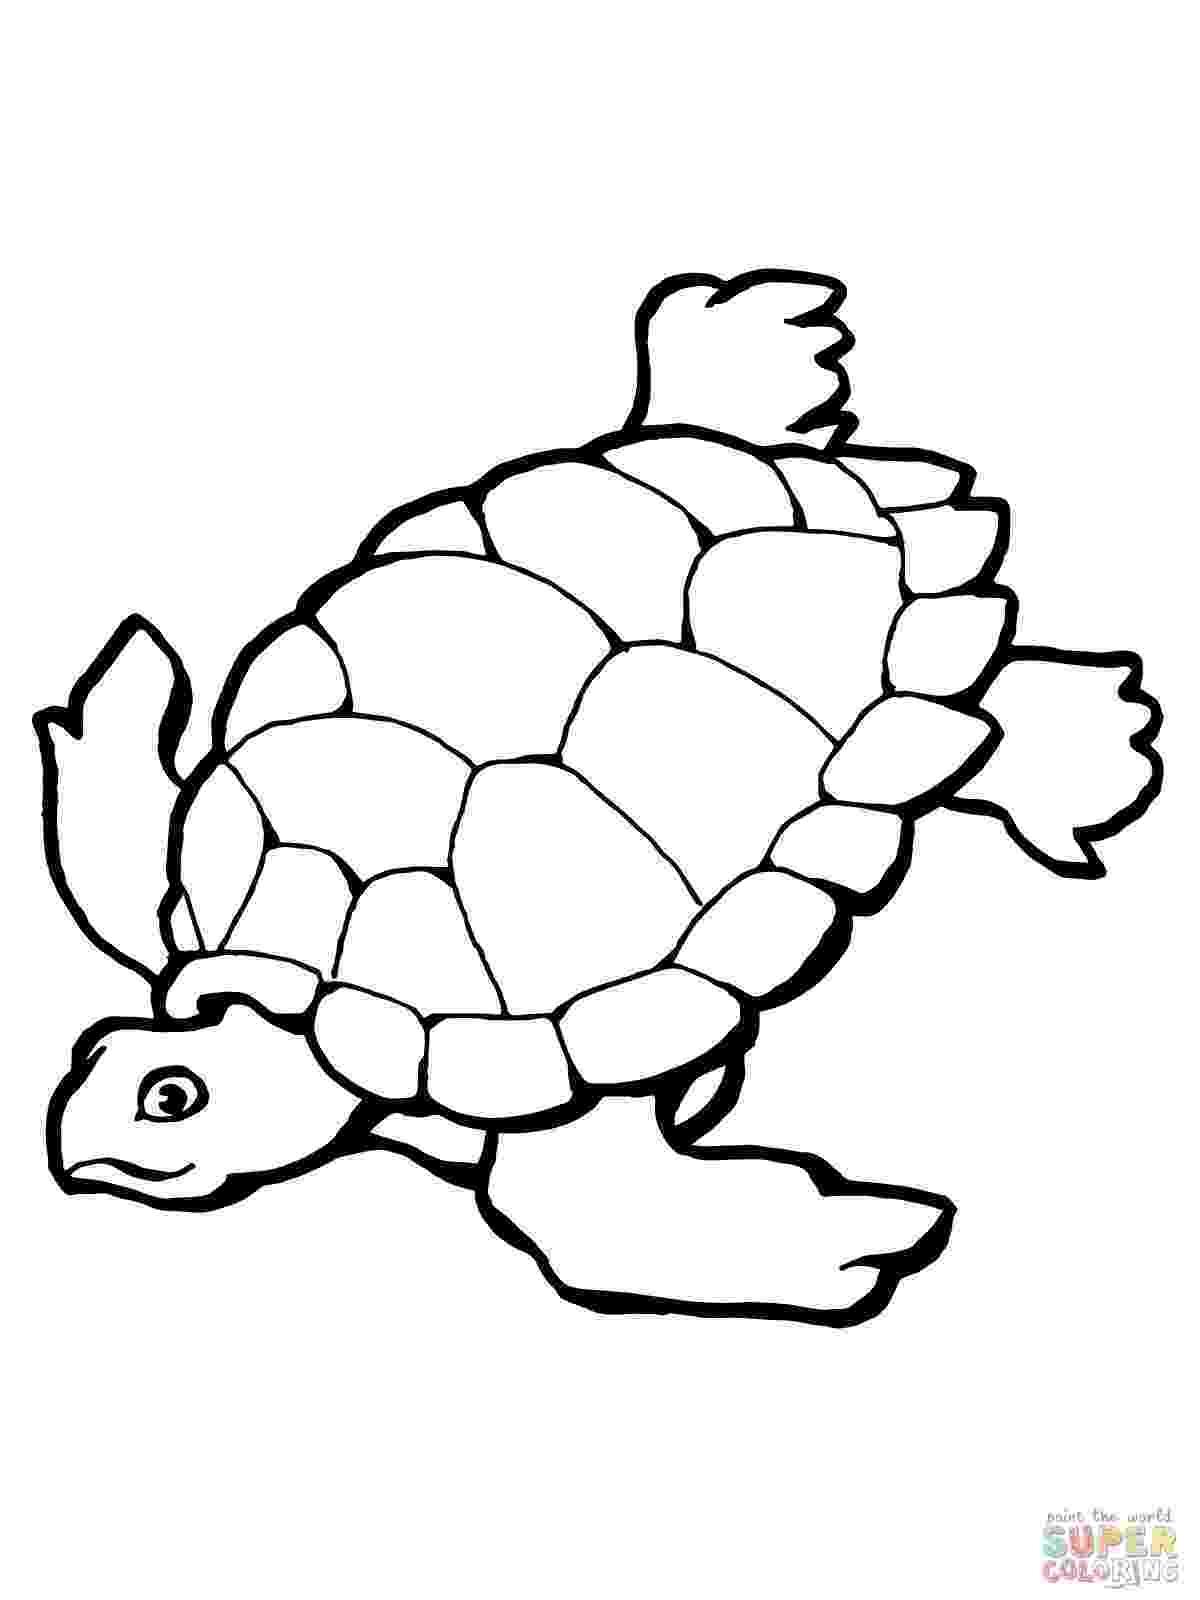 sea turtles coloring pages printable sea turtle coloring pages for kids cool2bkids pages coloring sea turtles